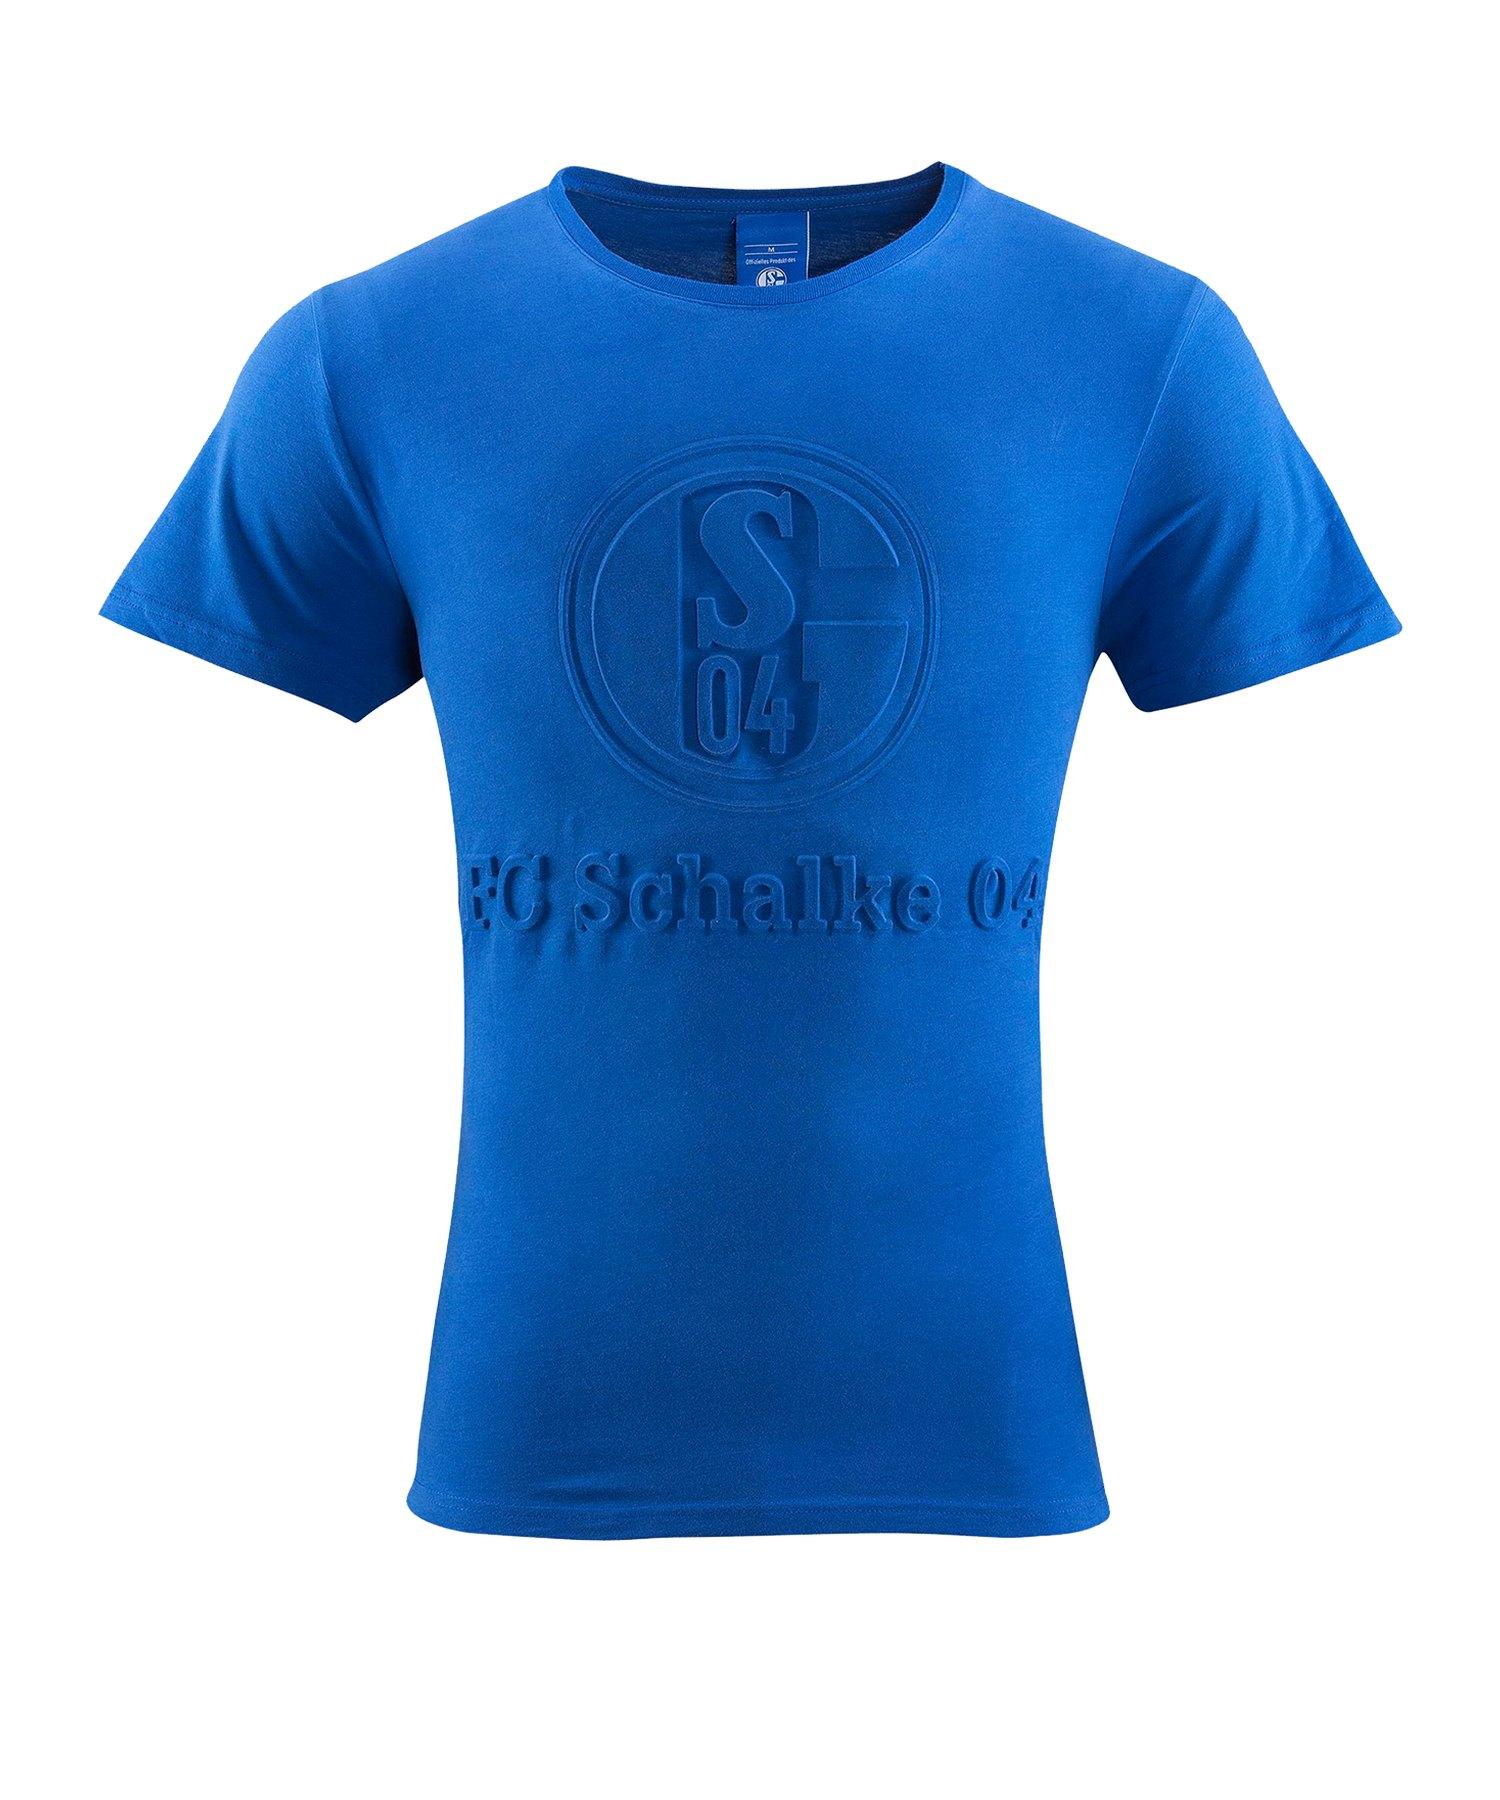 FC Schalke 04 T-Shirt Prägung - blau